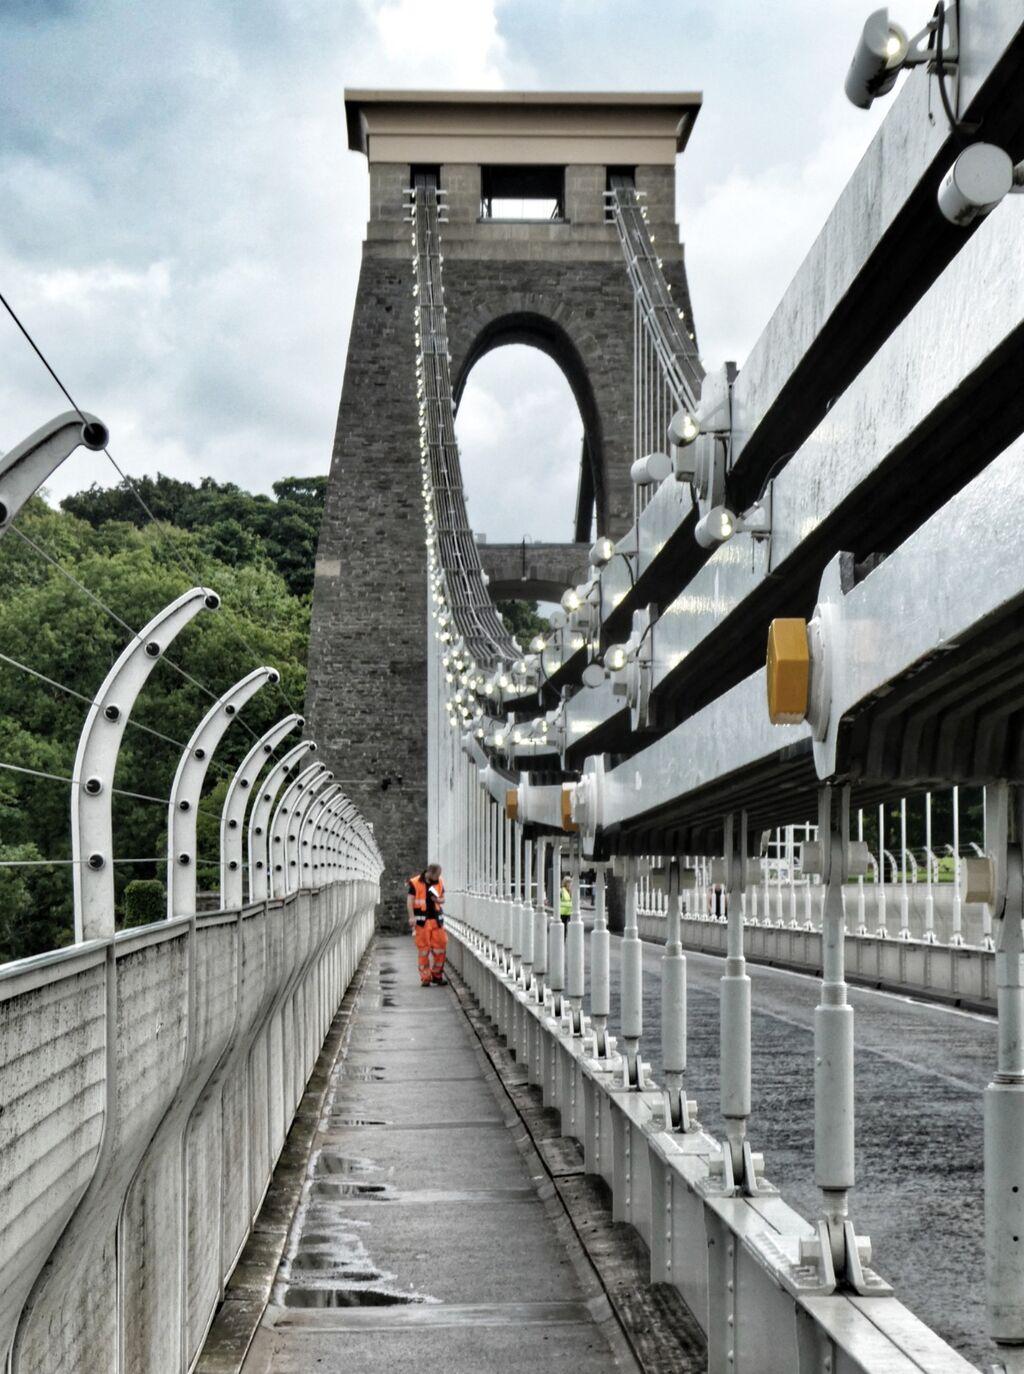 Clifton Suspension Bridge; Inspection